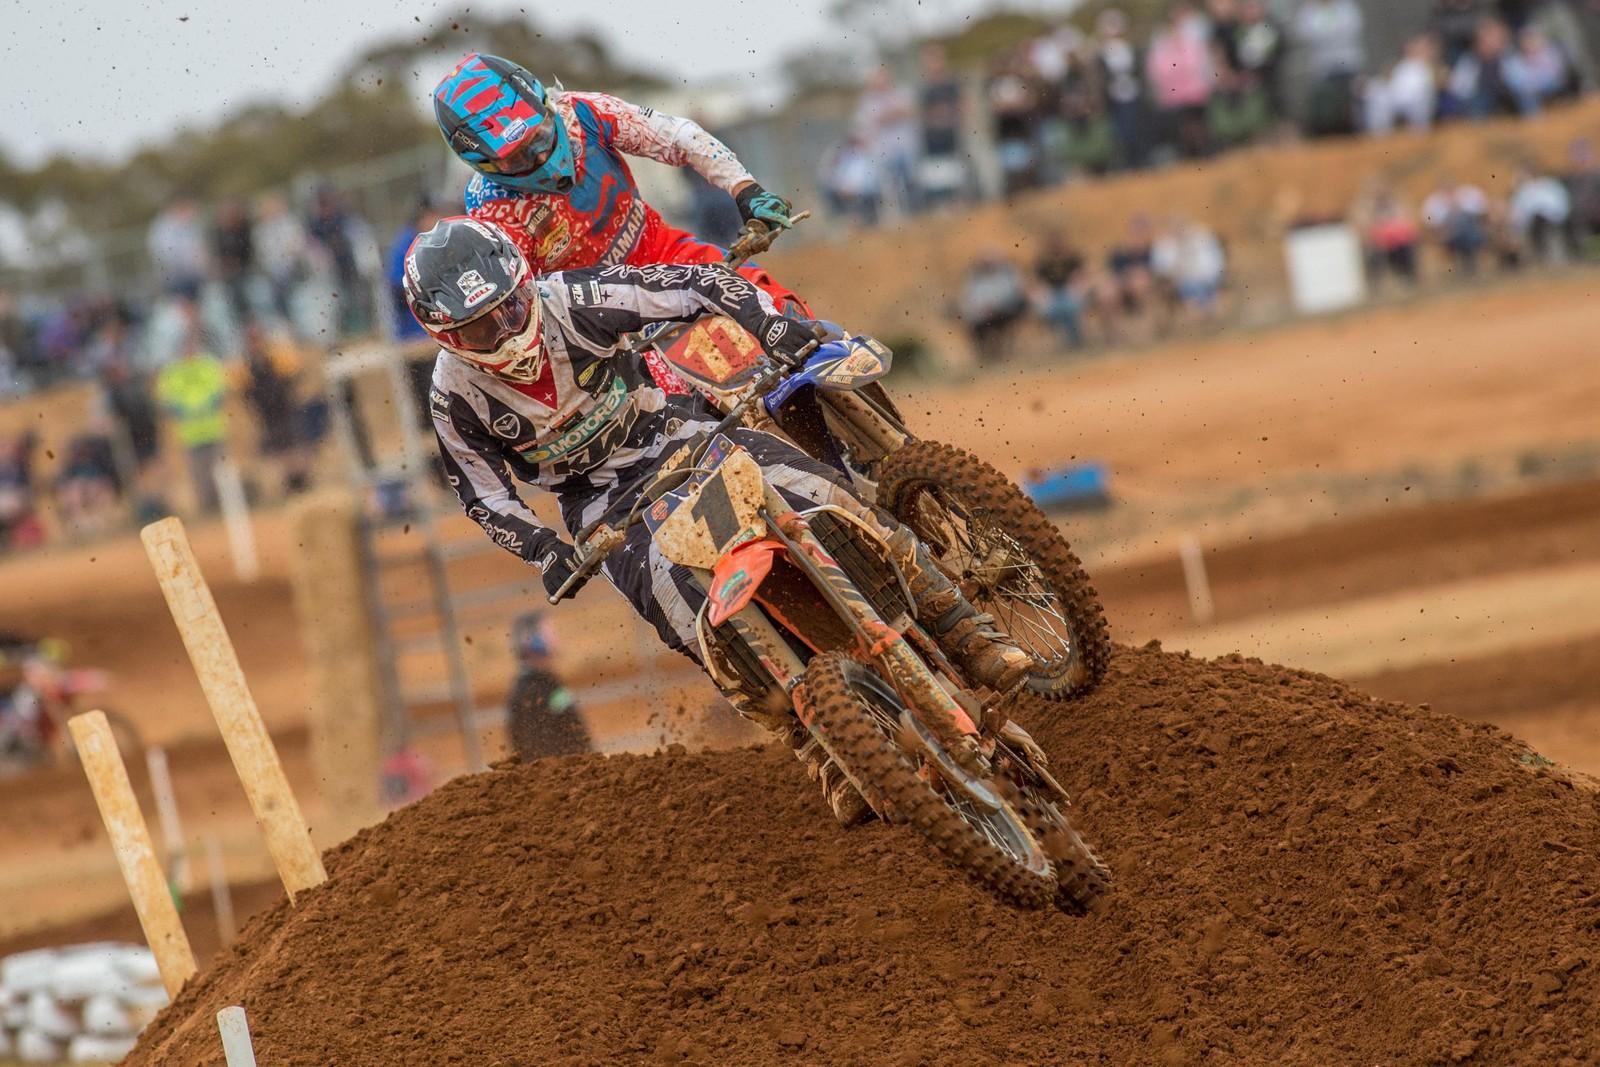 Kirk Gibbs - Australian Motul Mx Championships: Round 4, Murray Bridge - Motocross Pictures - Vital MX